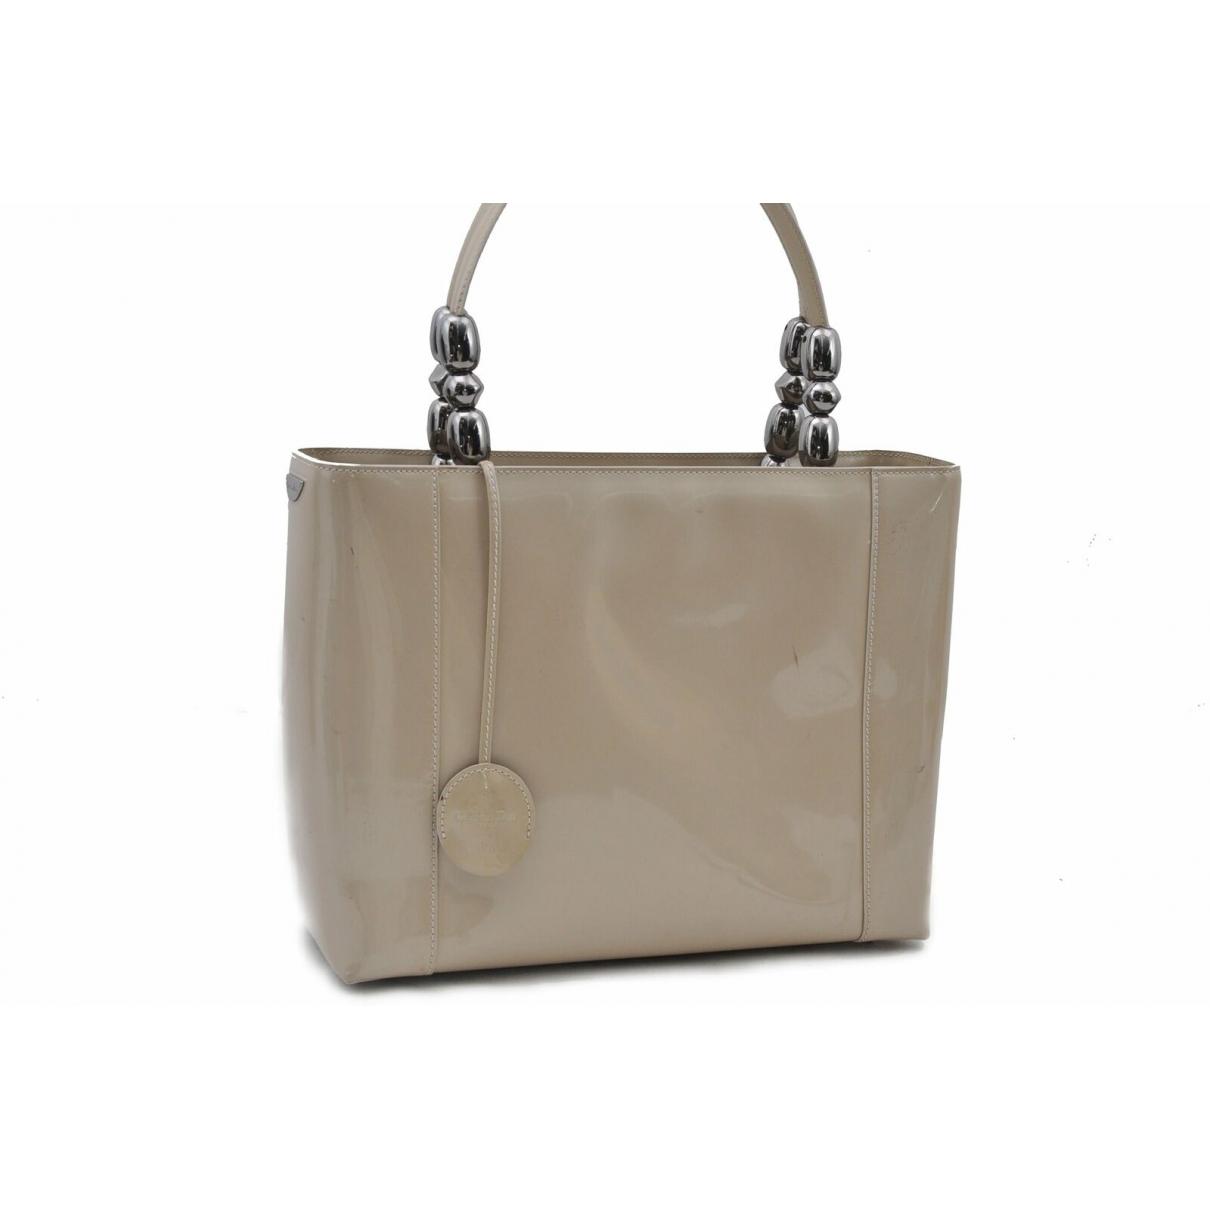 Dior \N Beige Patent leather handbag for Women \N